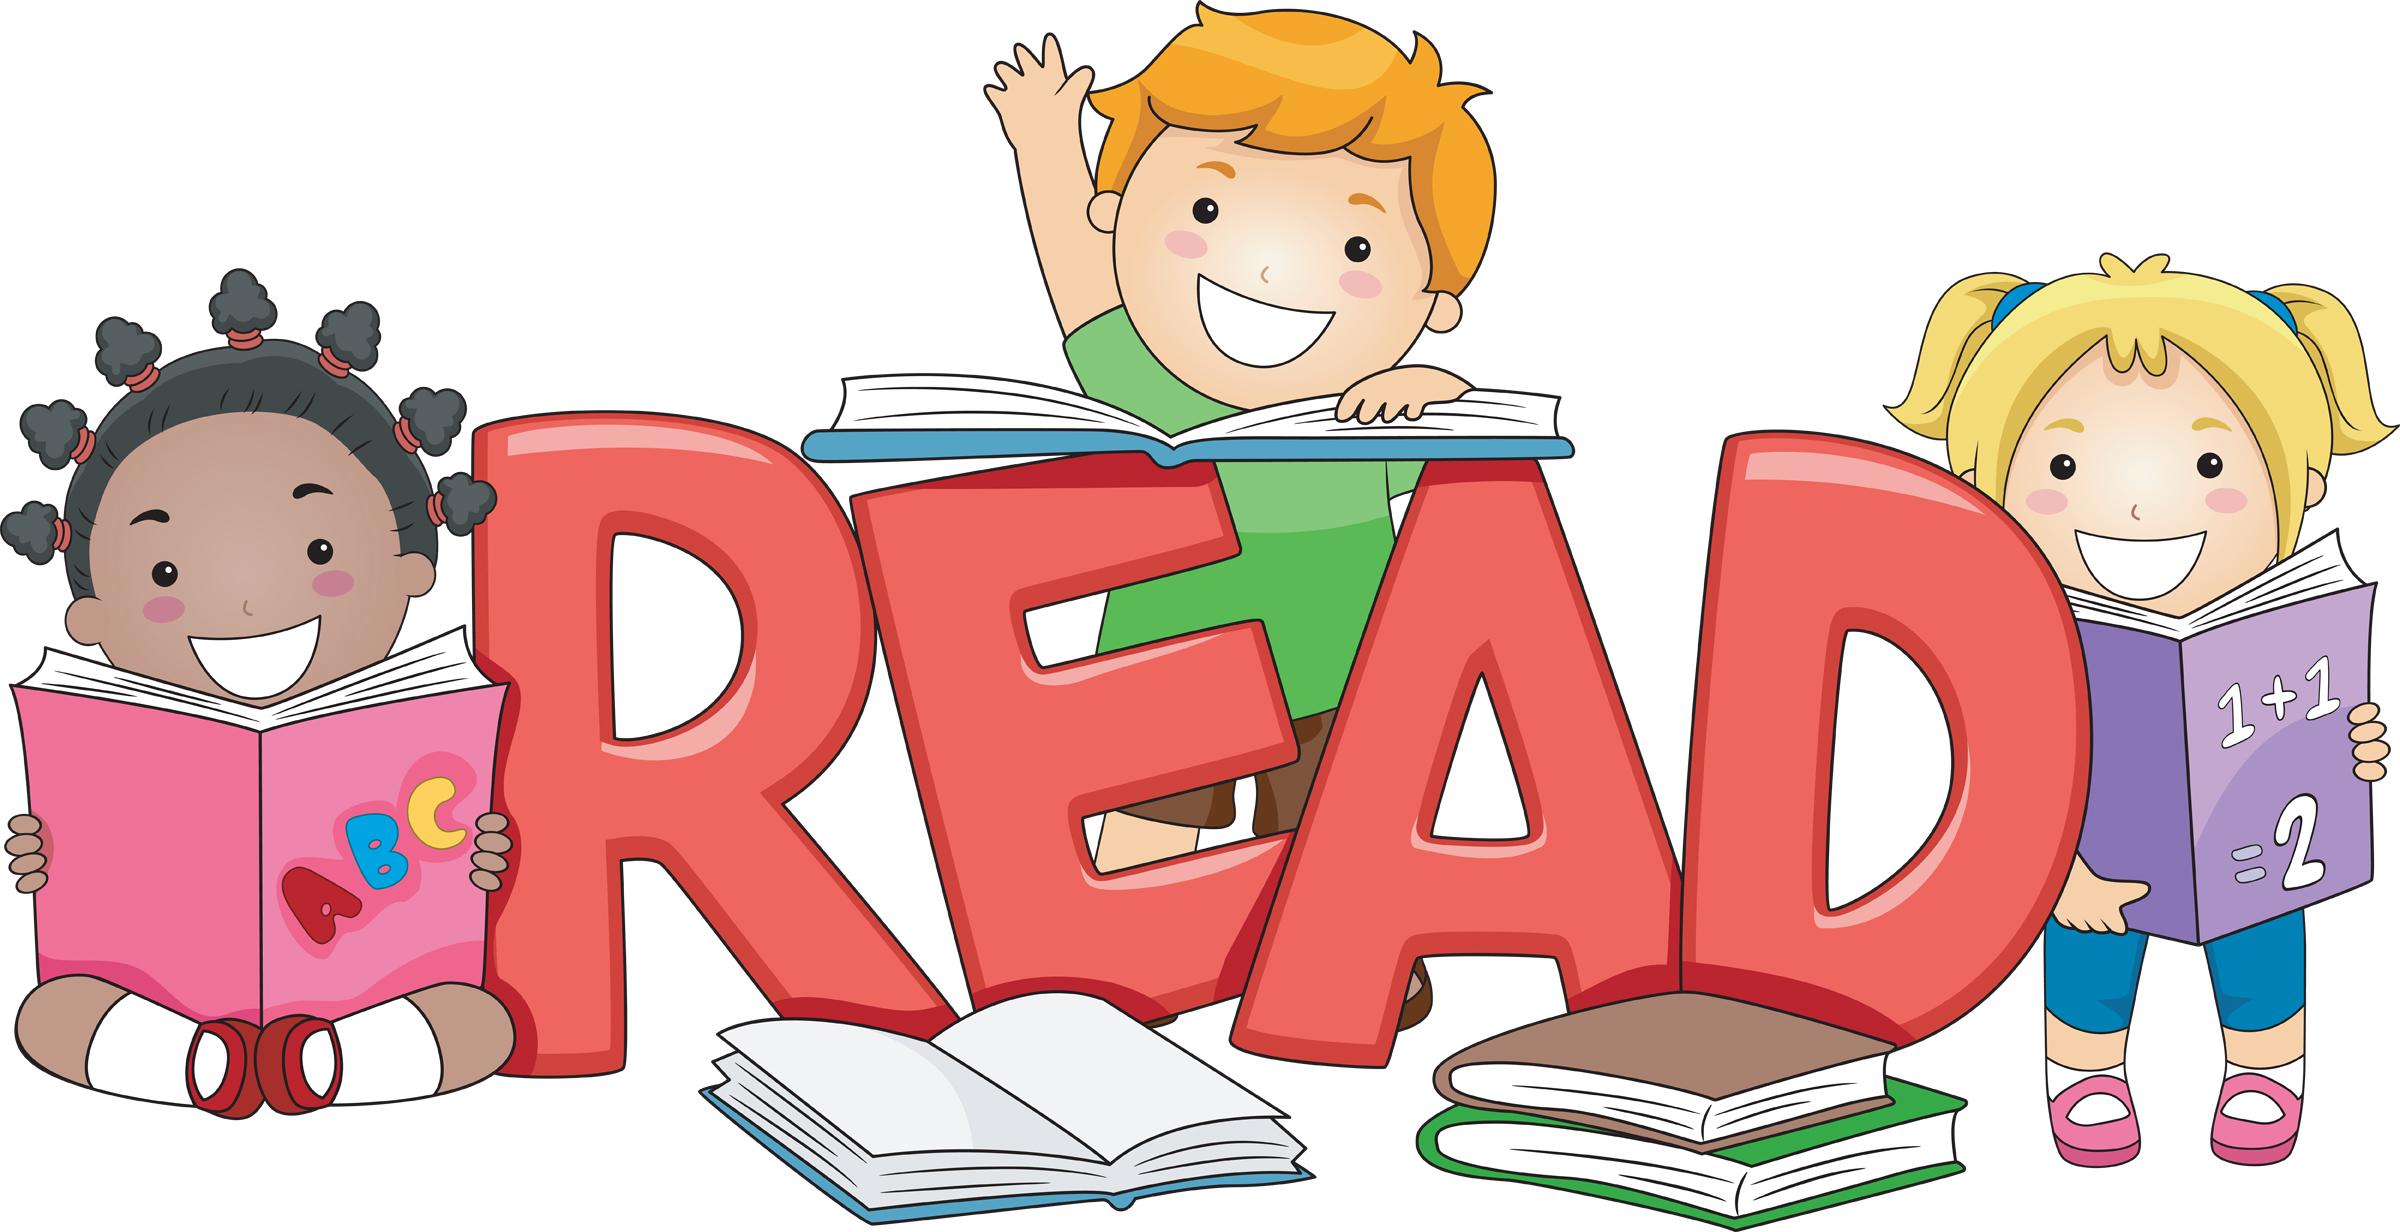 Reading cliparts vector Cute hour class clipart - Clip Art Library vector